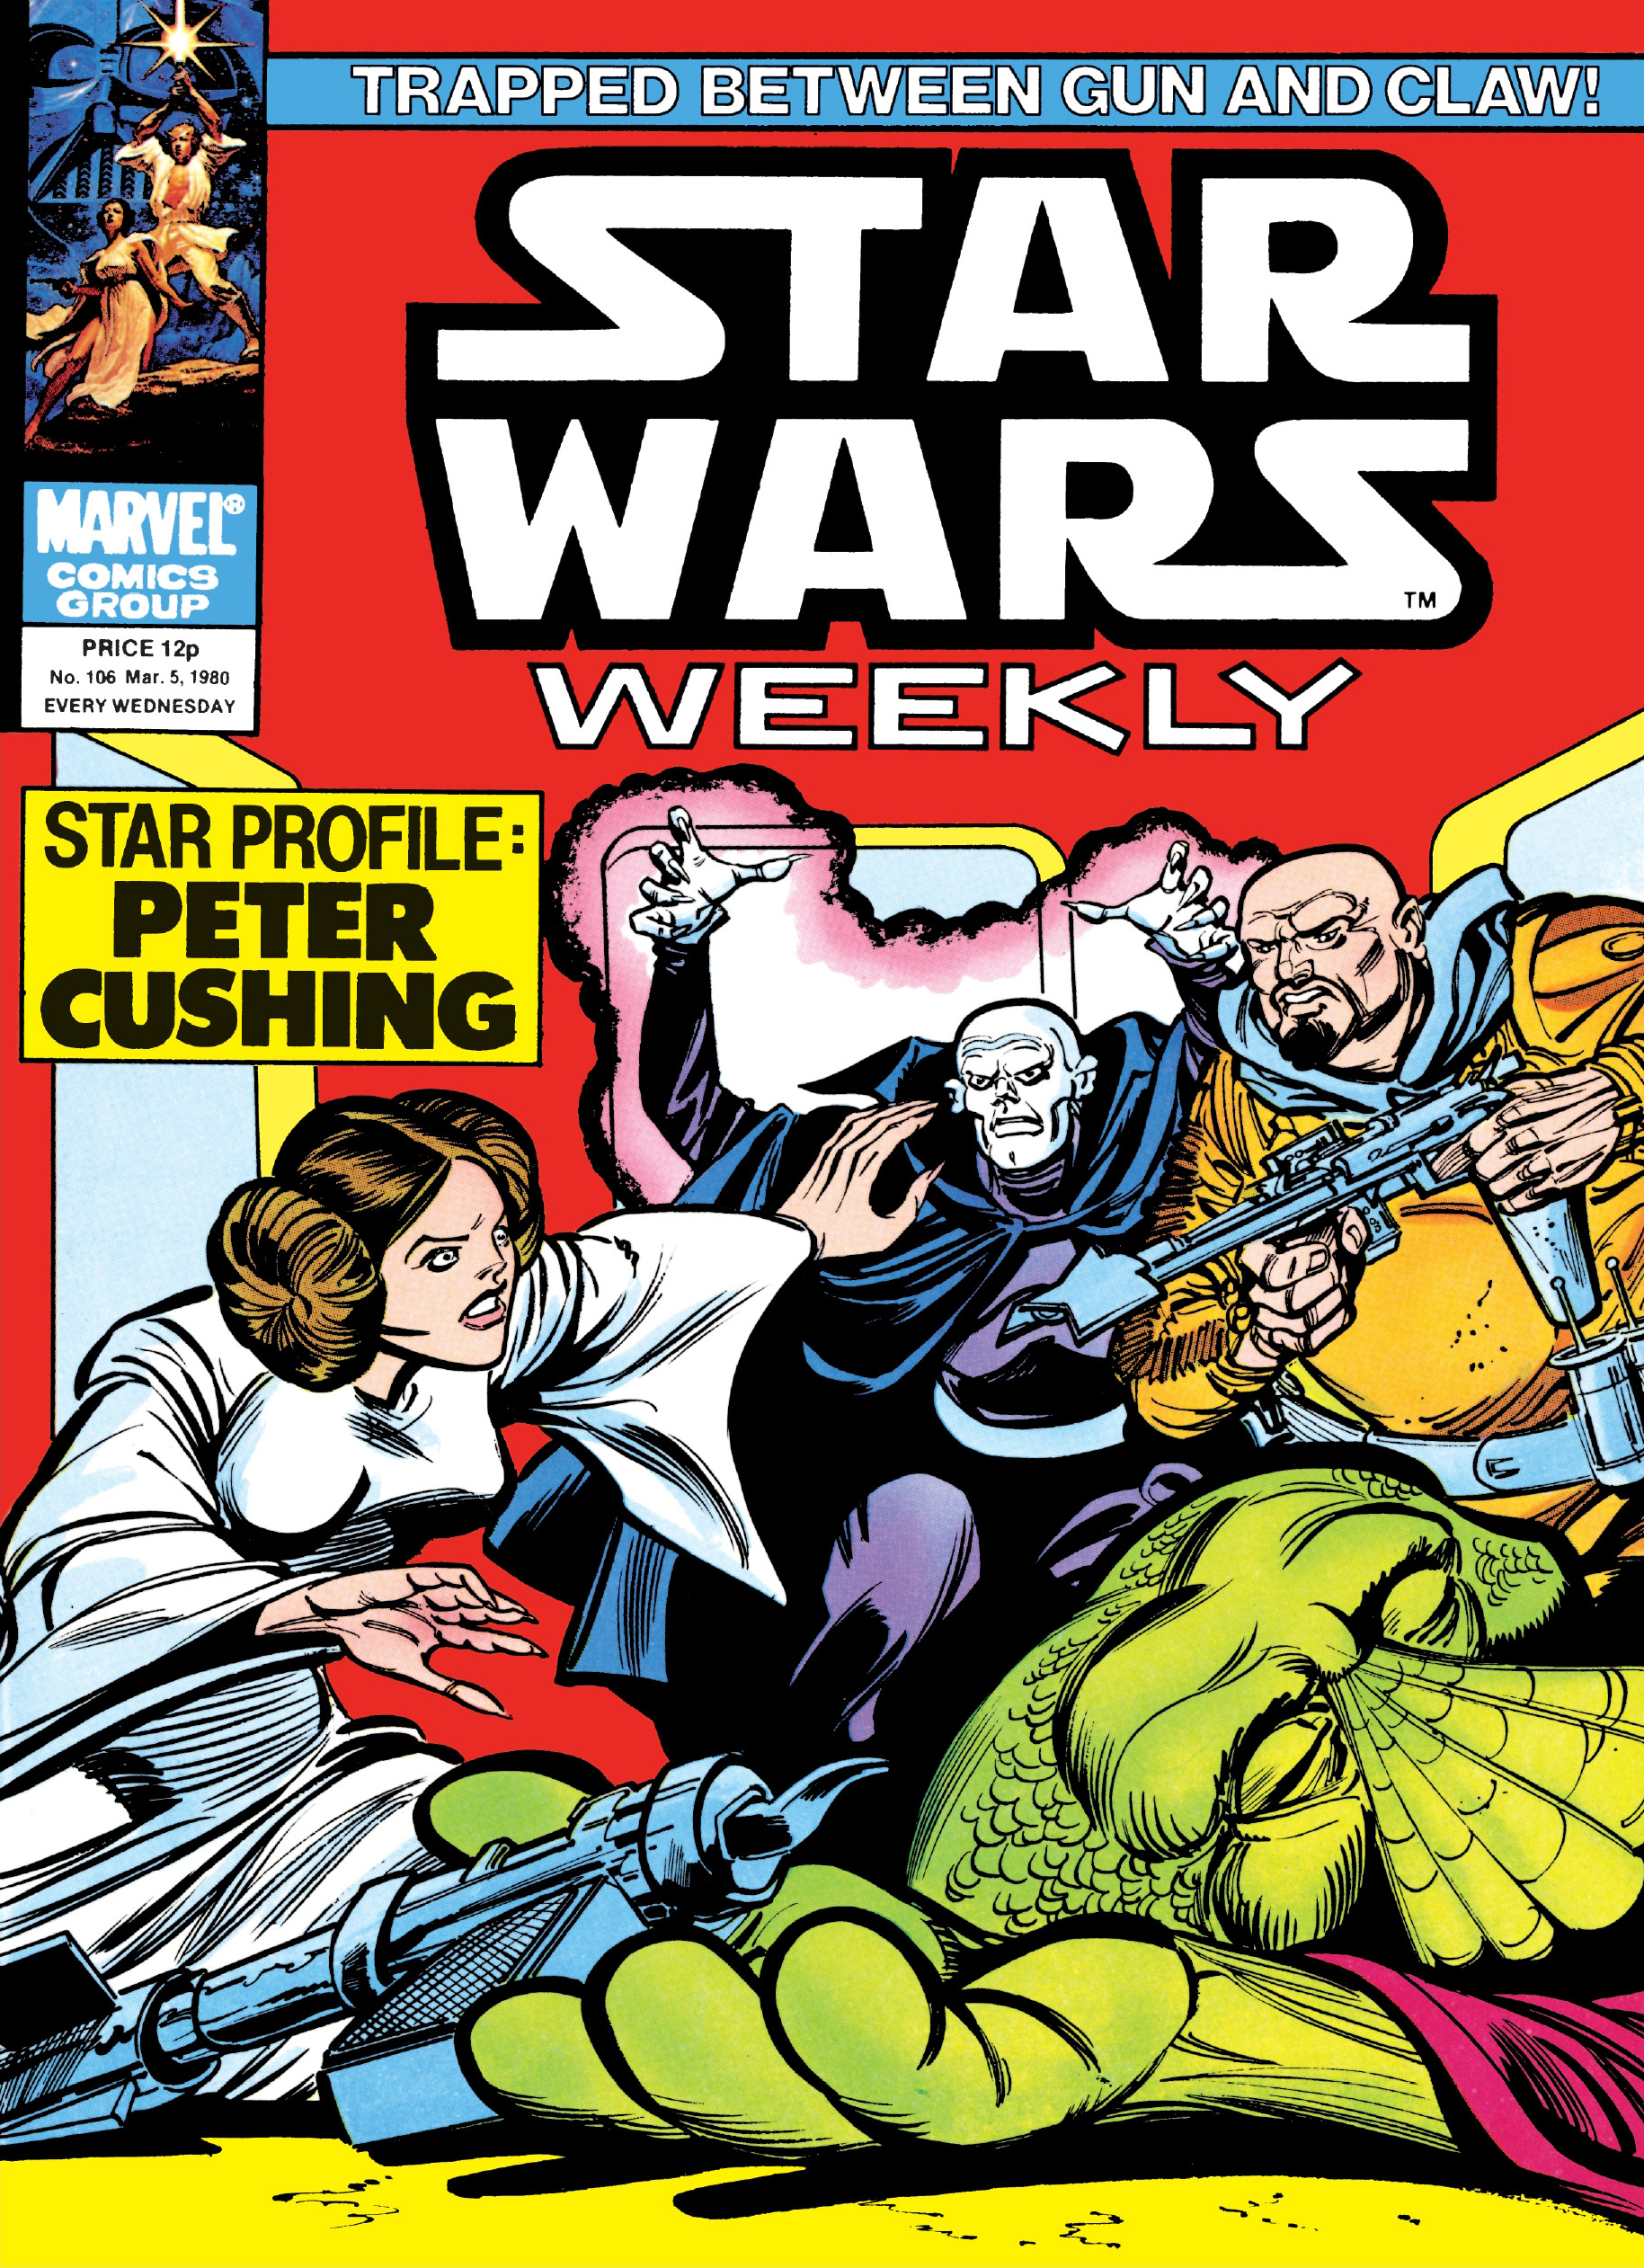 Star Wars Weekly 106